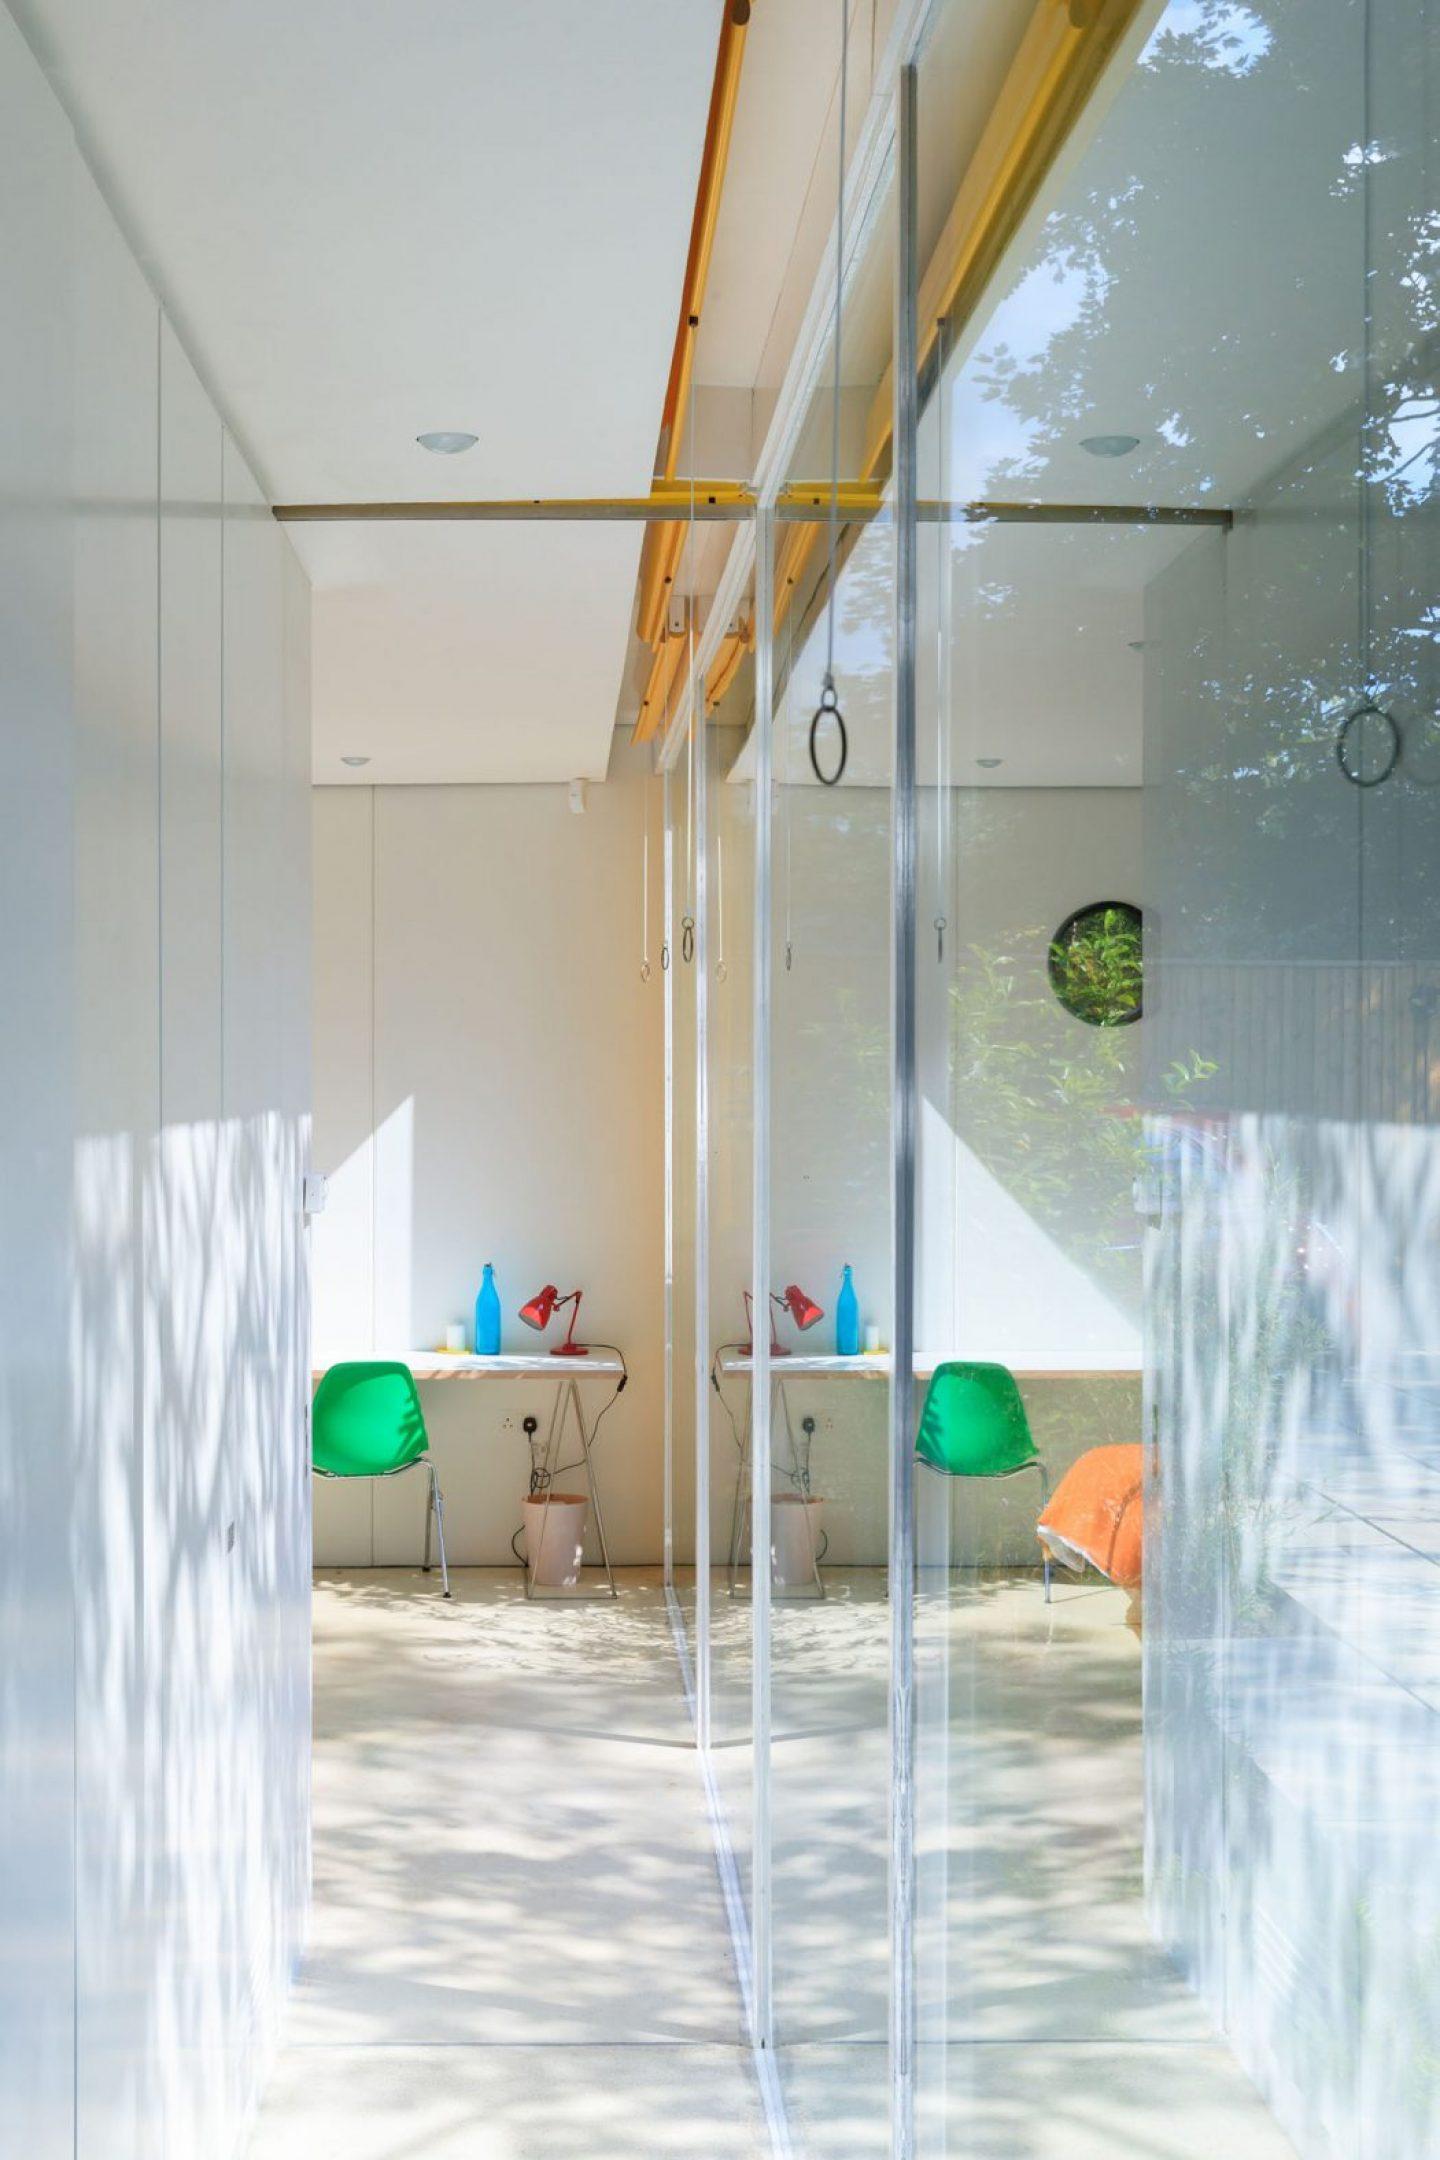 iGNANT_Architecture_Philip_Gumuchdjian_ Todd_Longstaffe_Gowan_Parkside_Wimbledon_House06